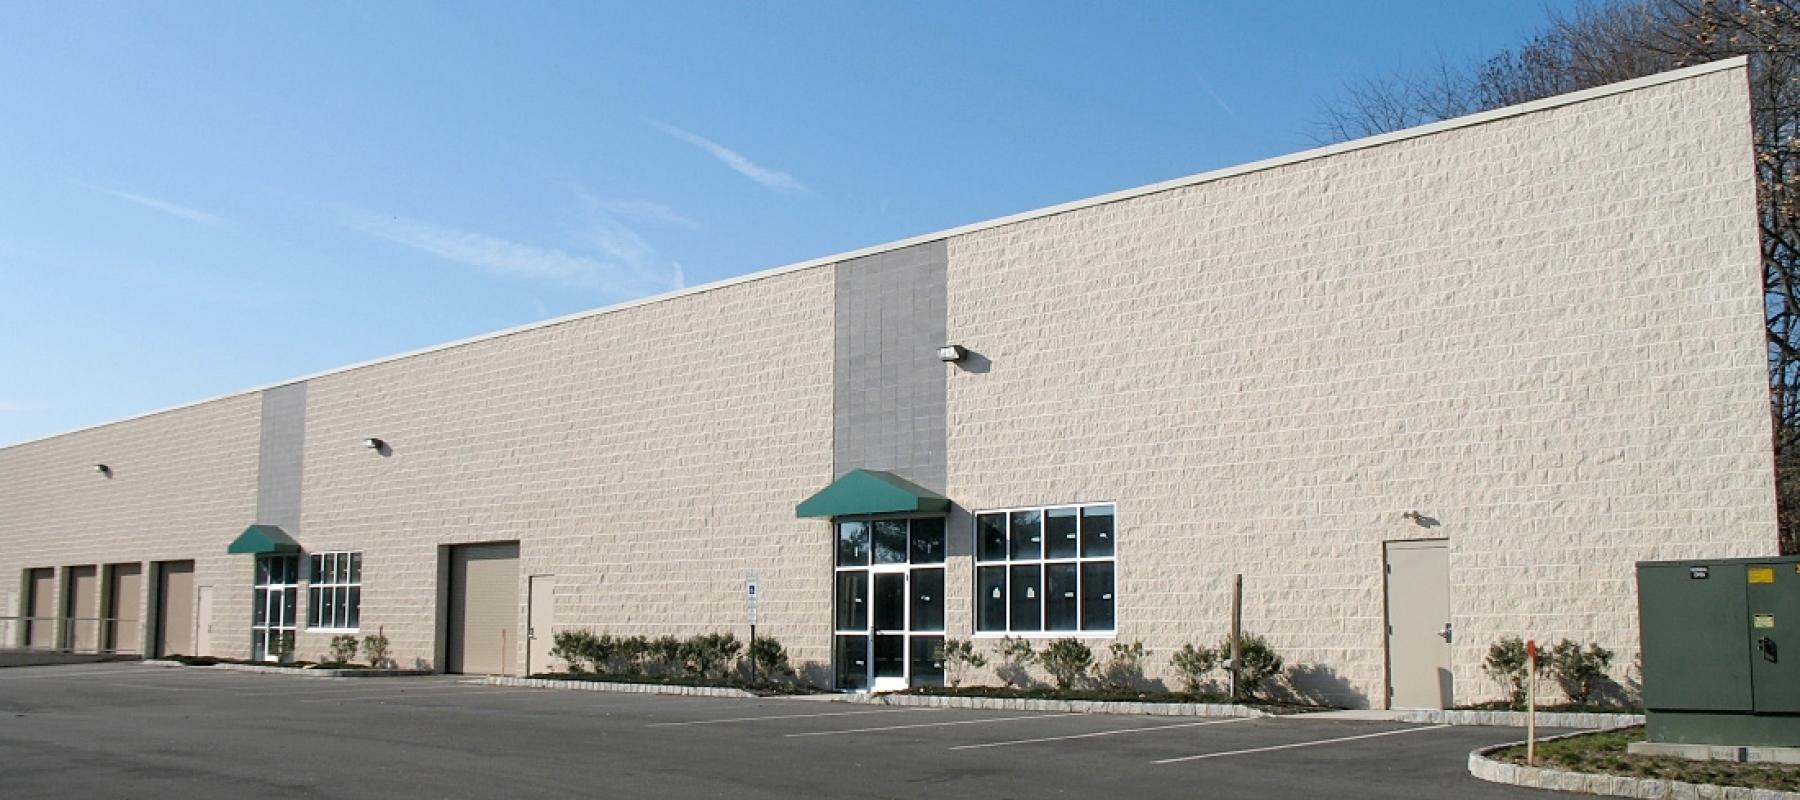 Ewing I-95 warehouse